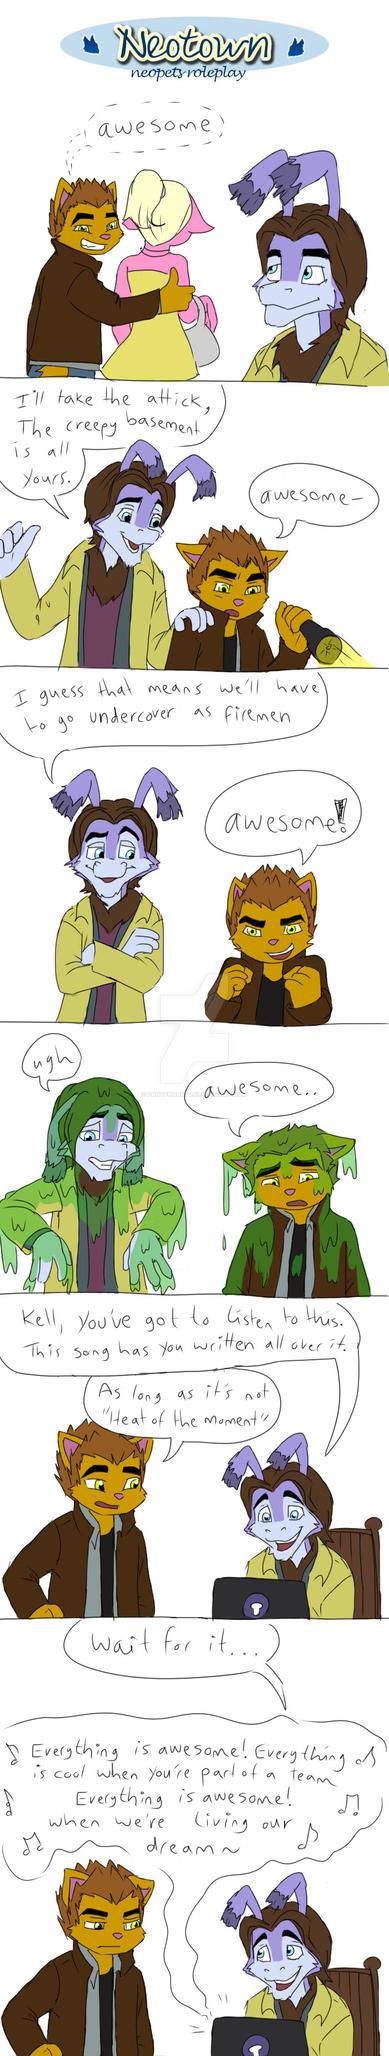 Corbin and Kell: Awesome by fanofnaruto